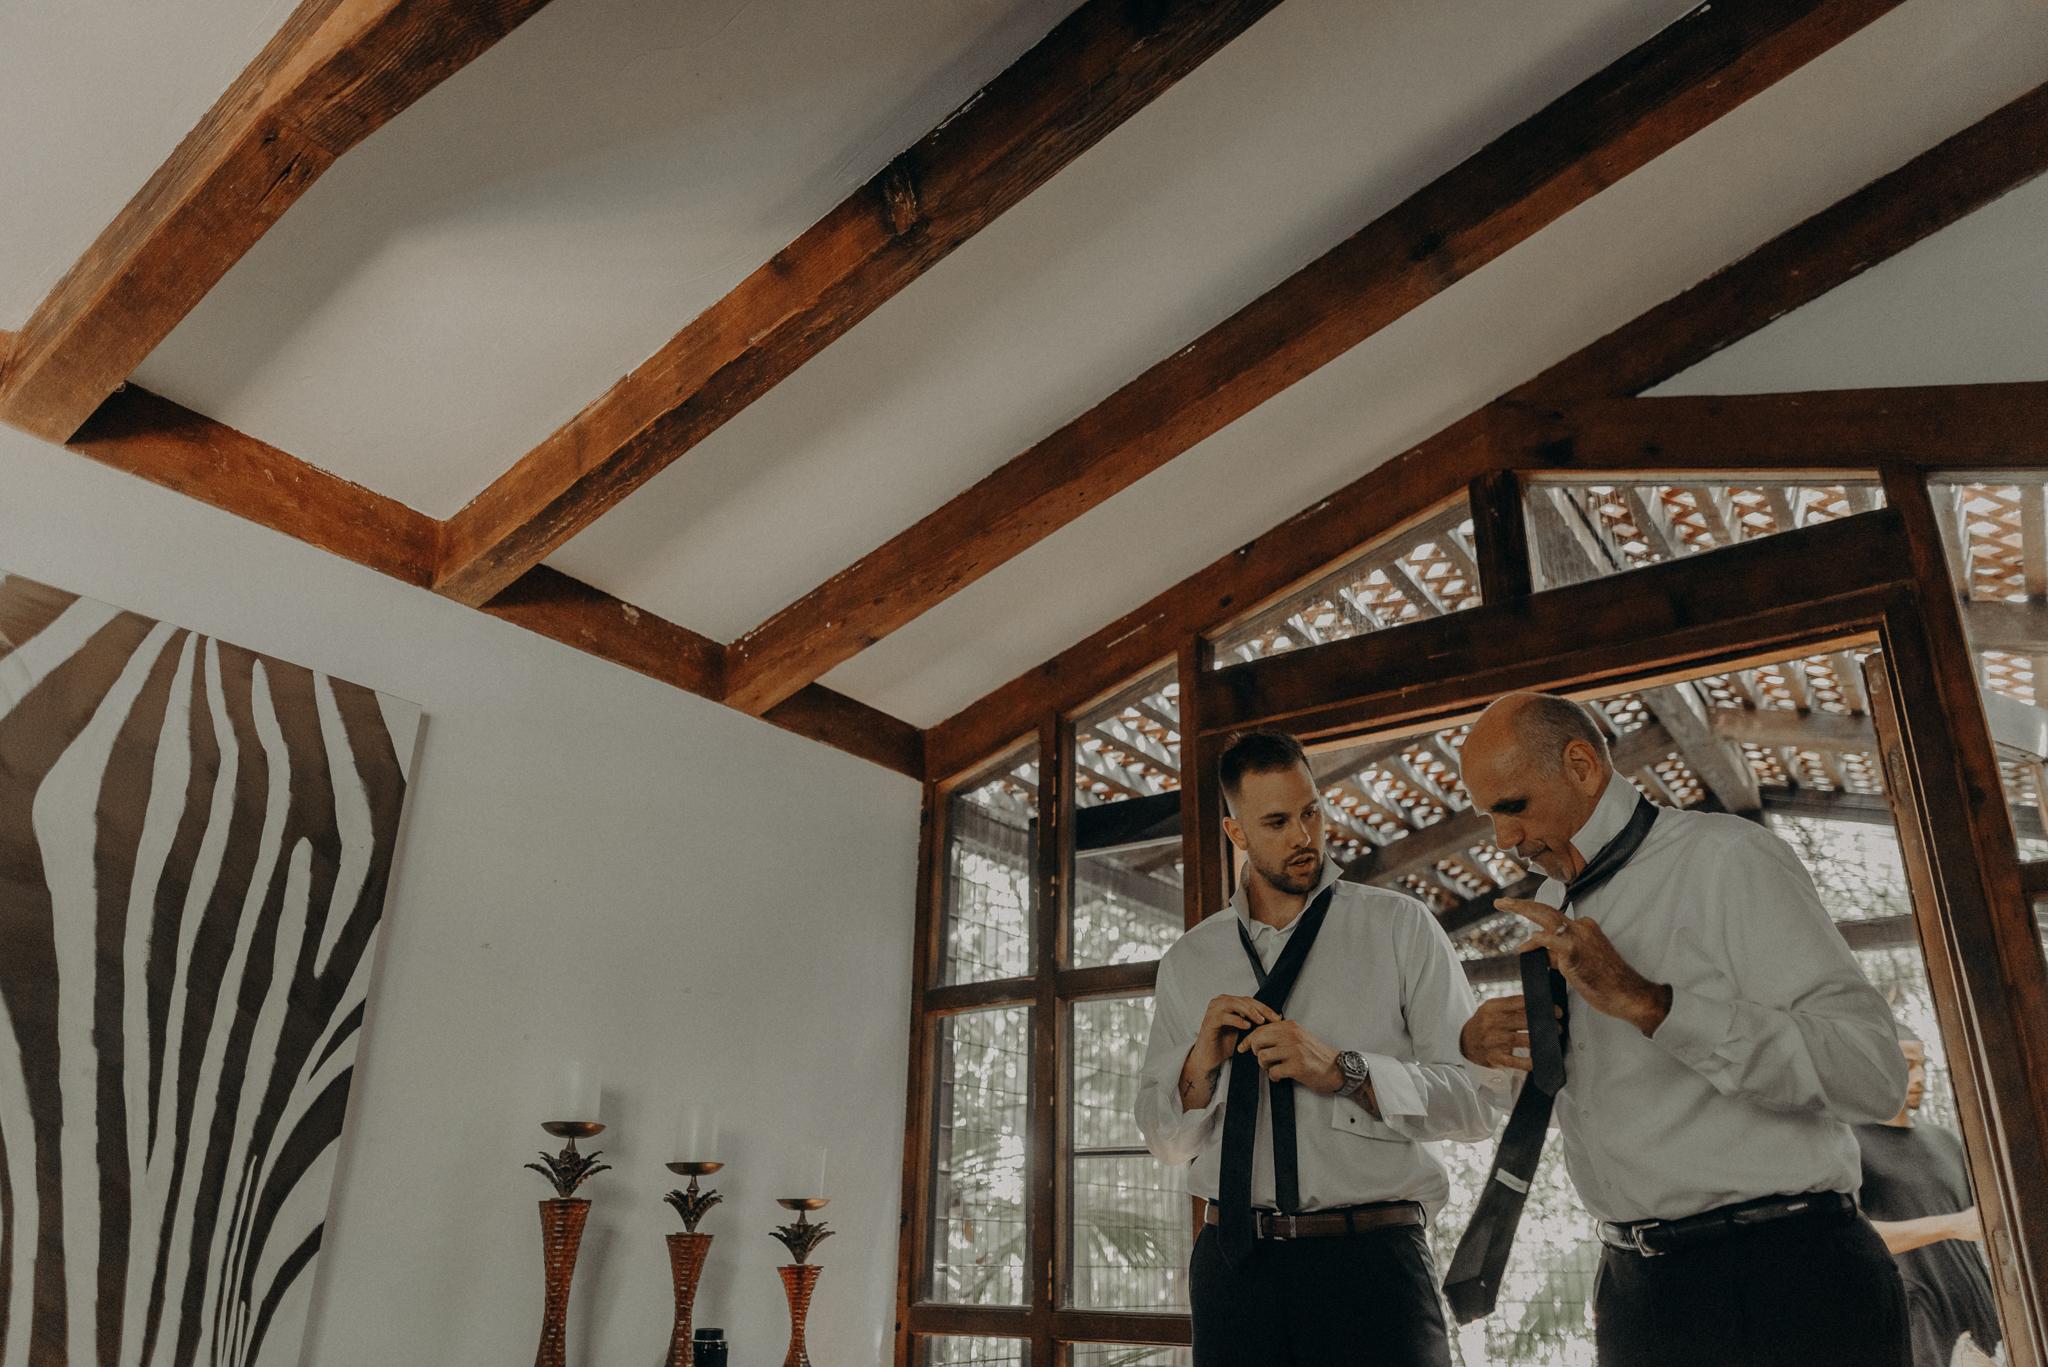 Isaiah + Taylor Photography - Rancho Las Lomas Wedding, Los Angeles Wedding Photographer-019.jpg